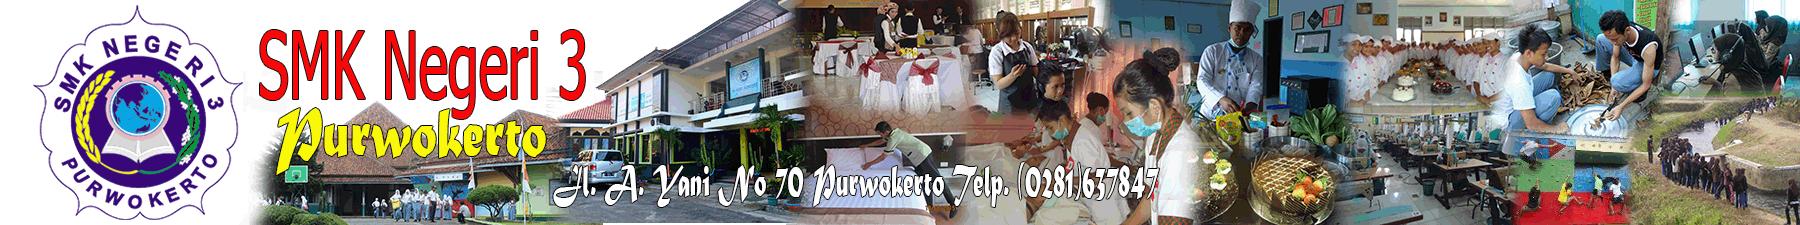 SMK N 3 Purwokerto